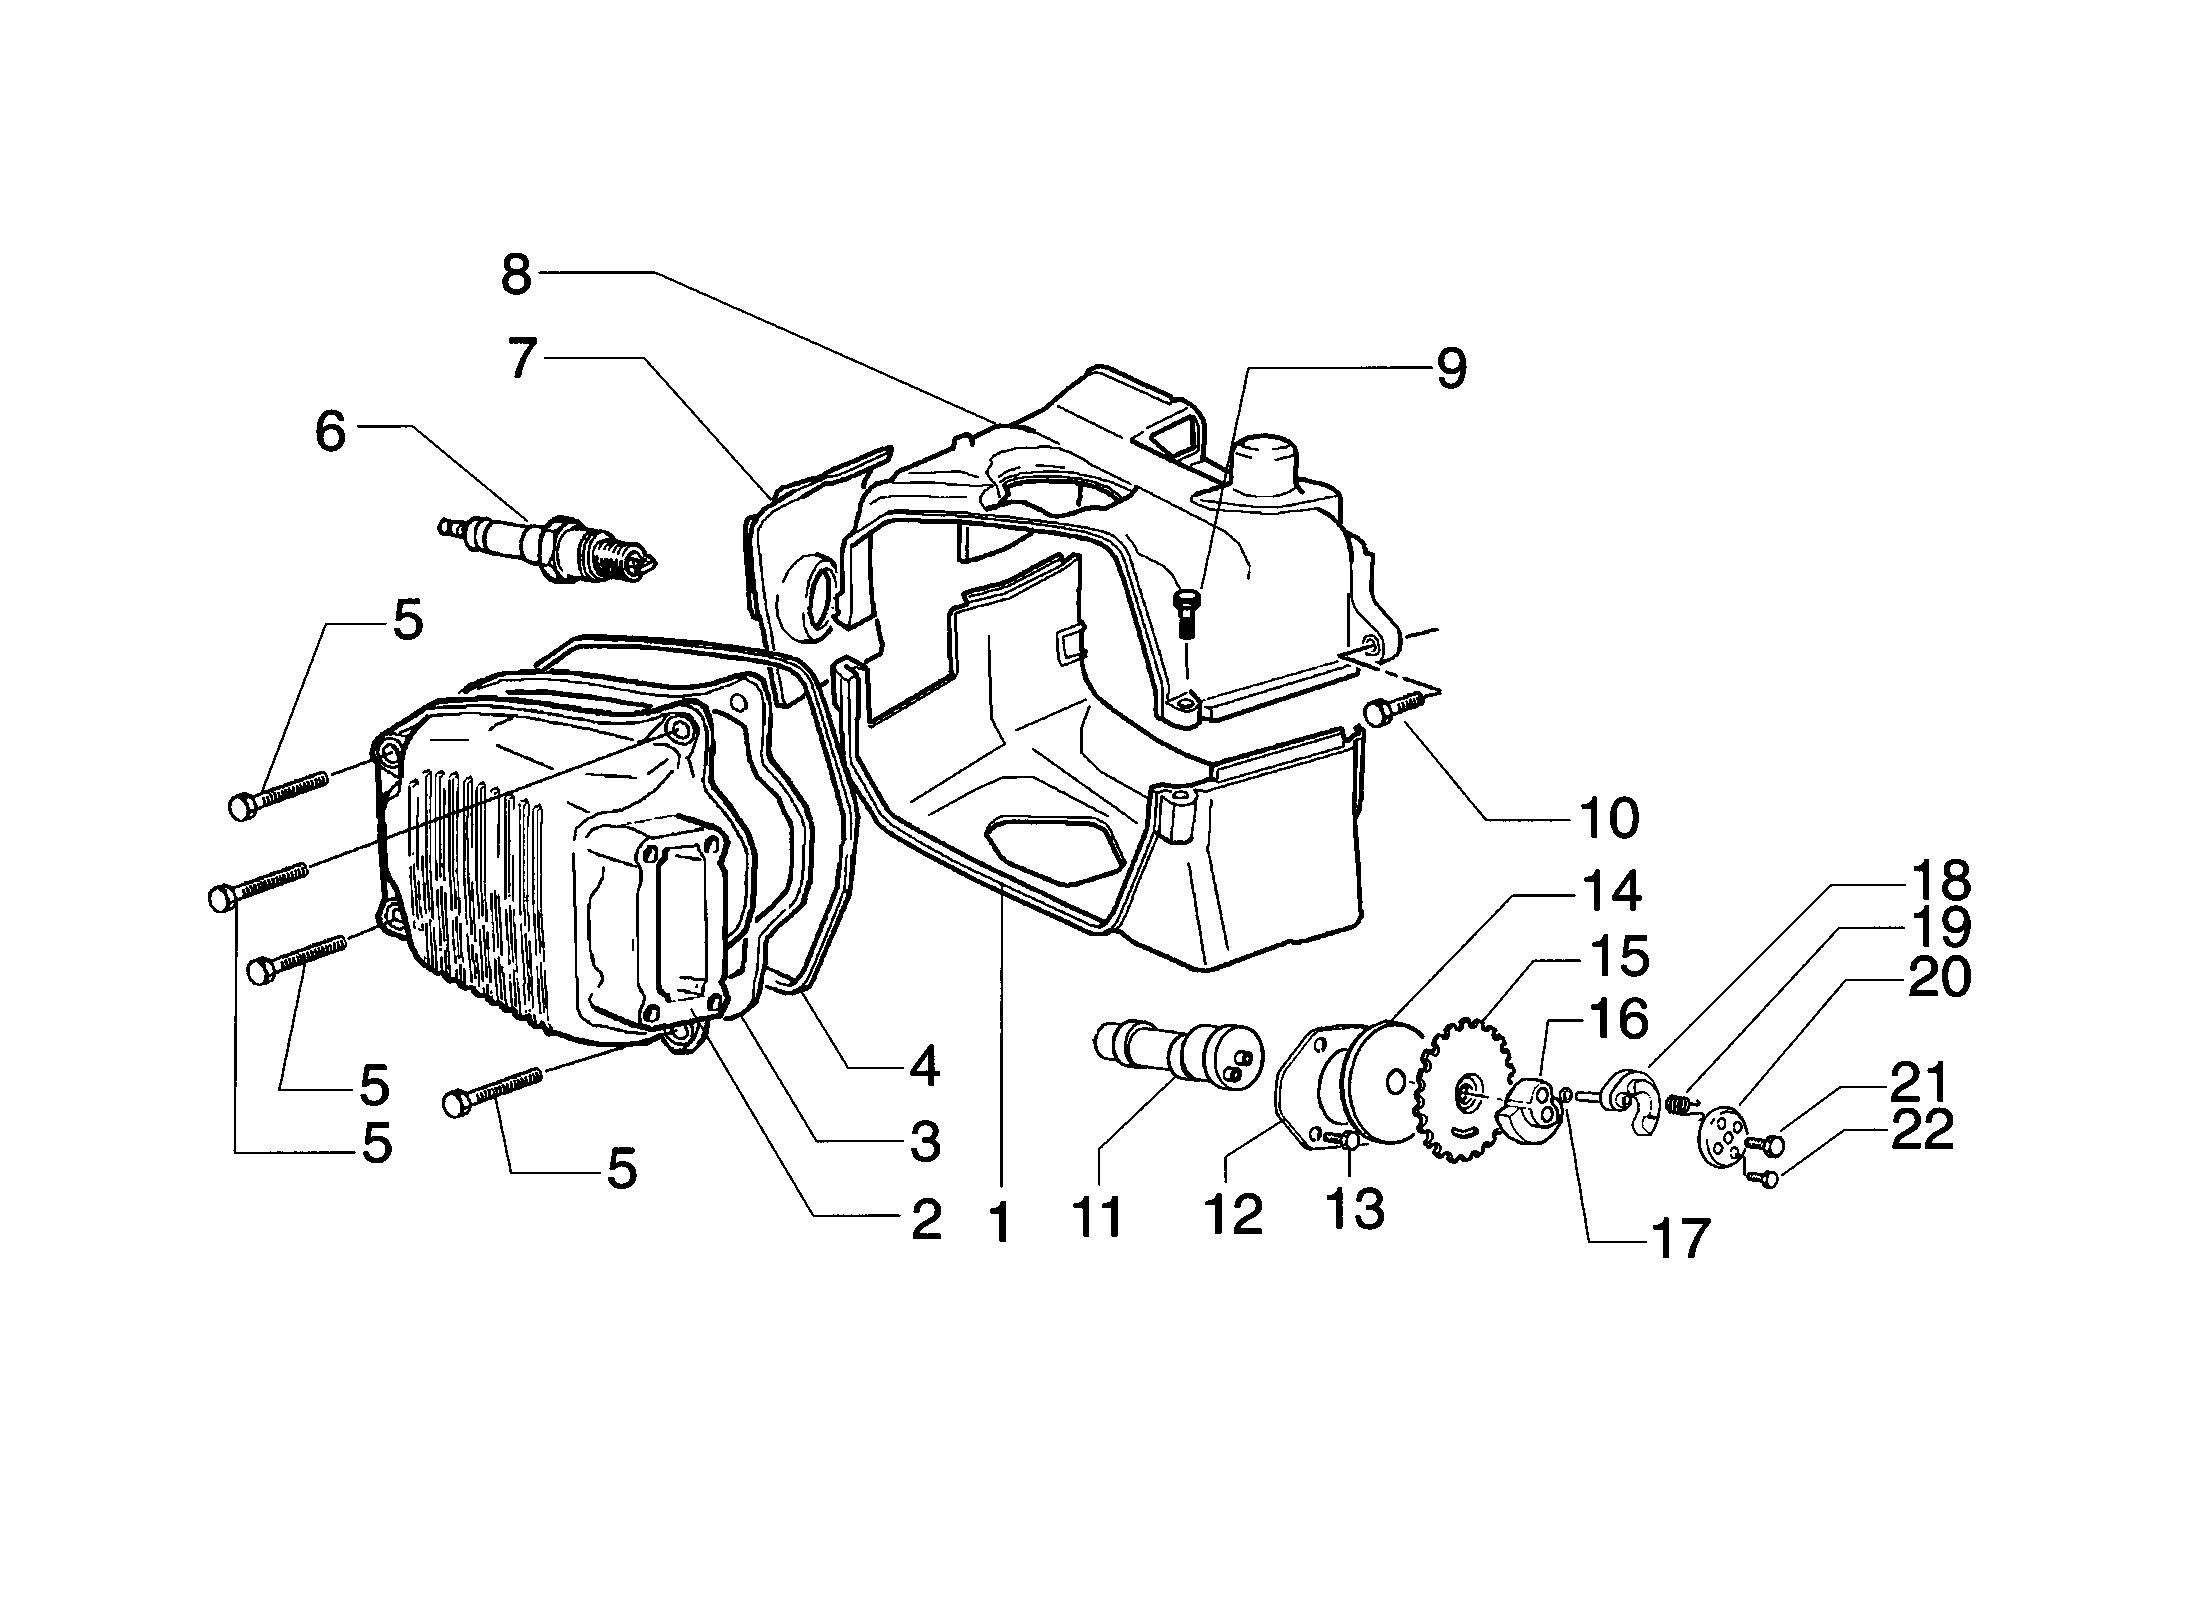 Ventildeckel/Nockenwelle